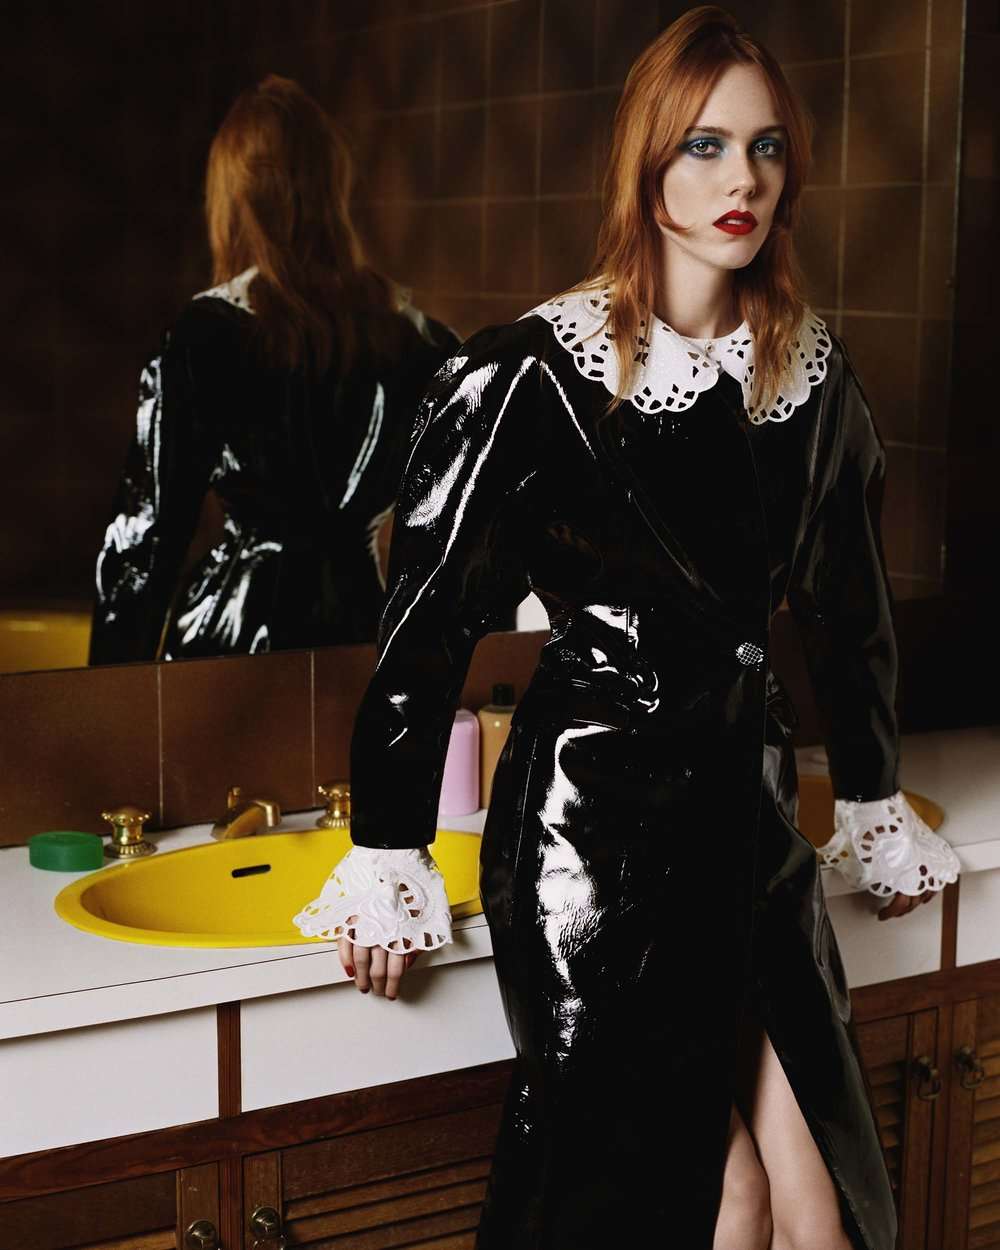 christopher_kane_london_fashion_week_ss18_lfwss18_fabl_magazine_shop.jpg